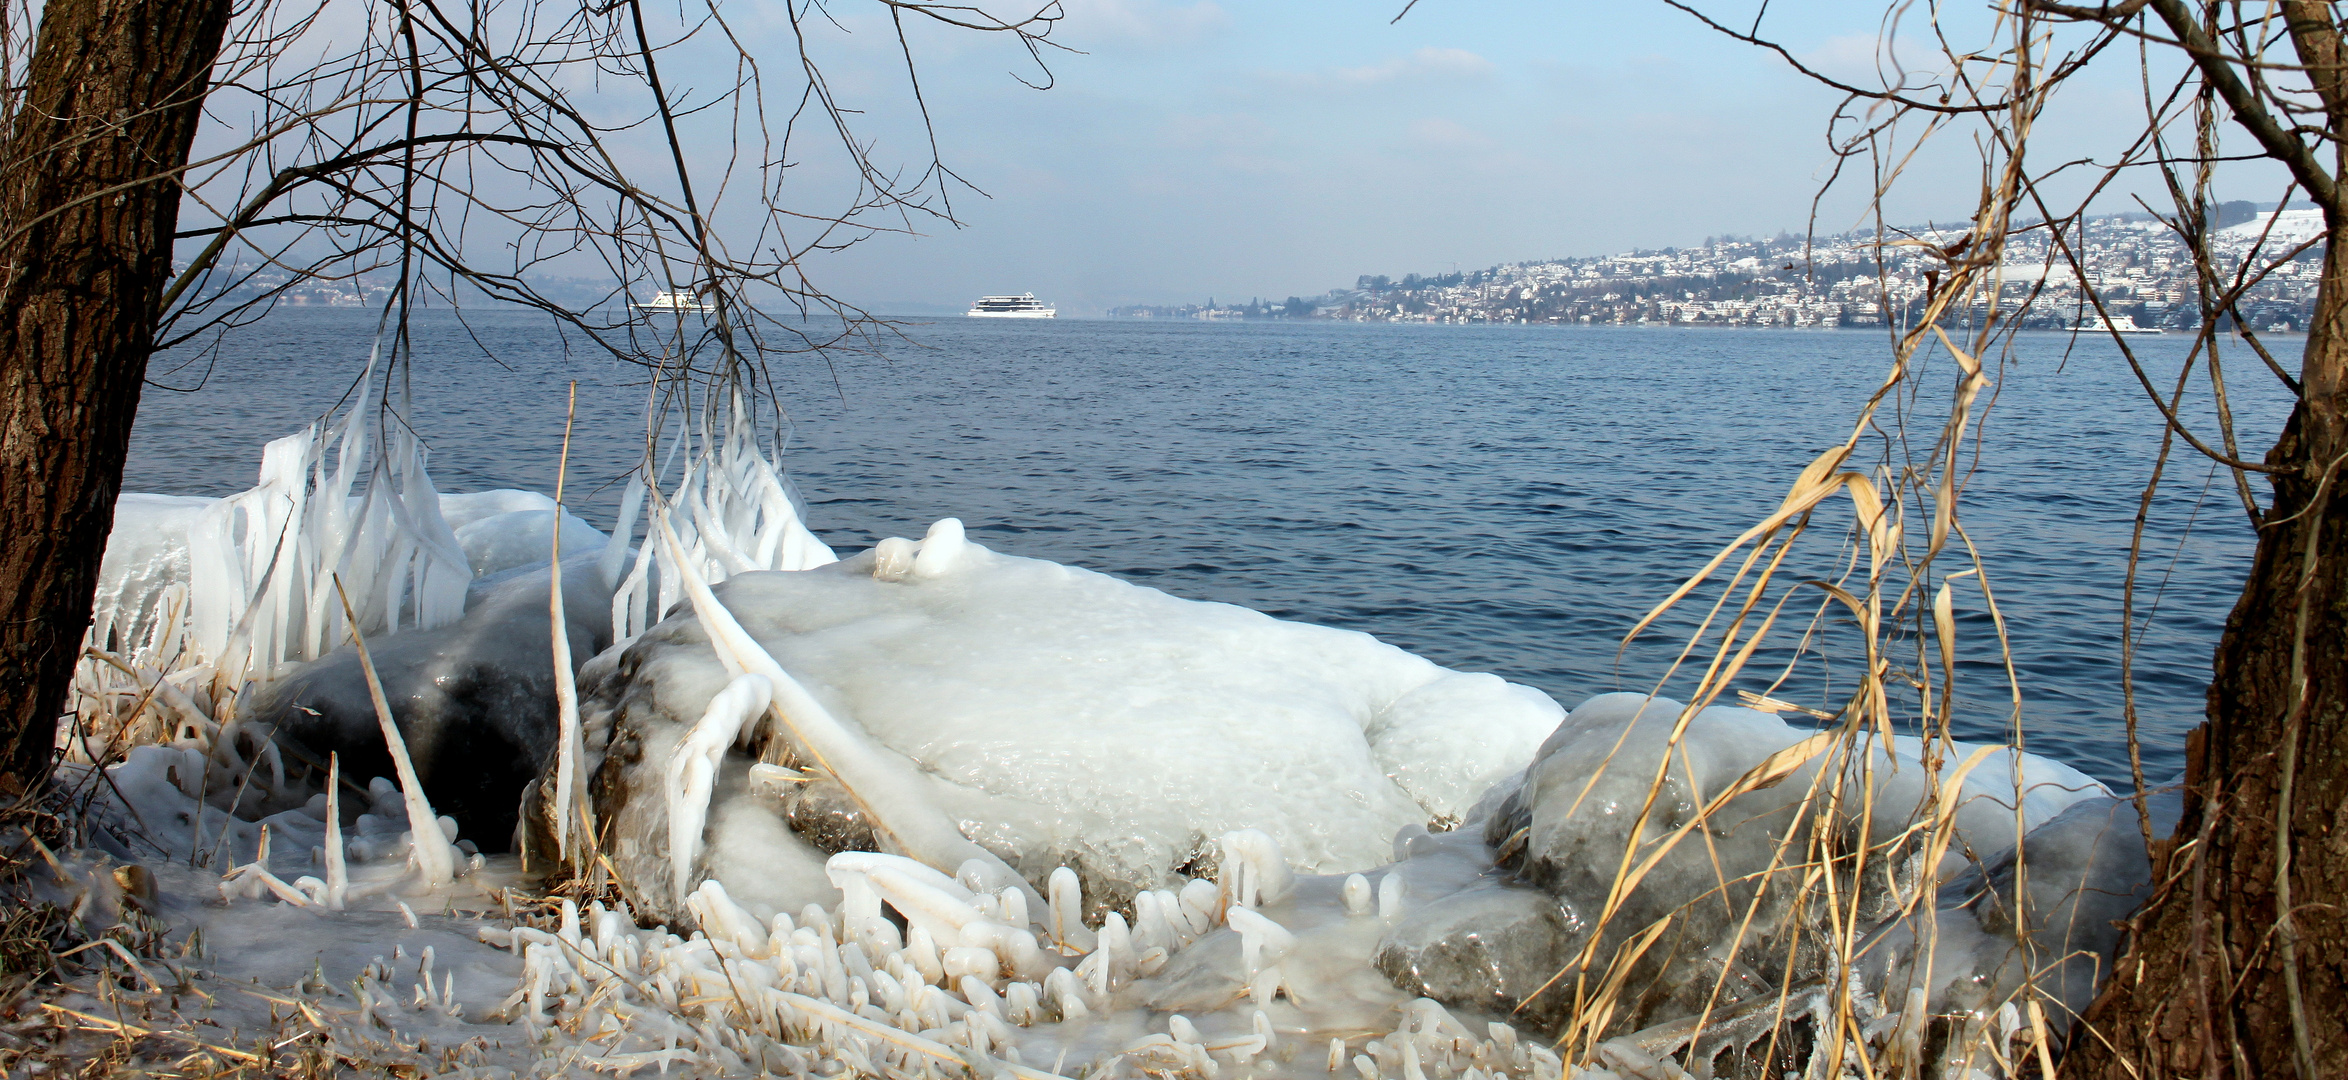 Winterimpressionen / impresiónes invierno / Impressions d'hiver..06